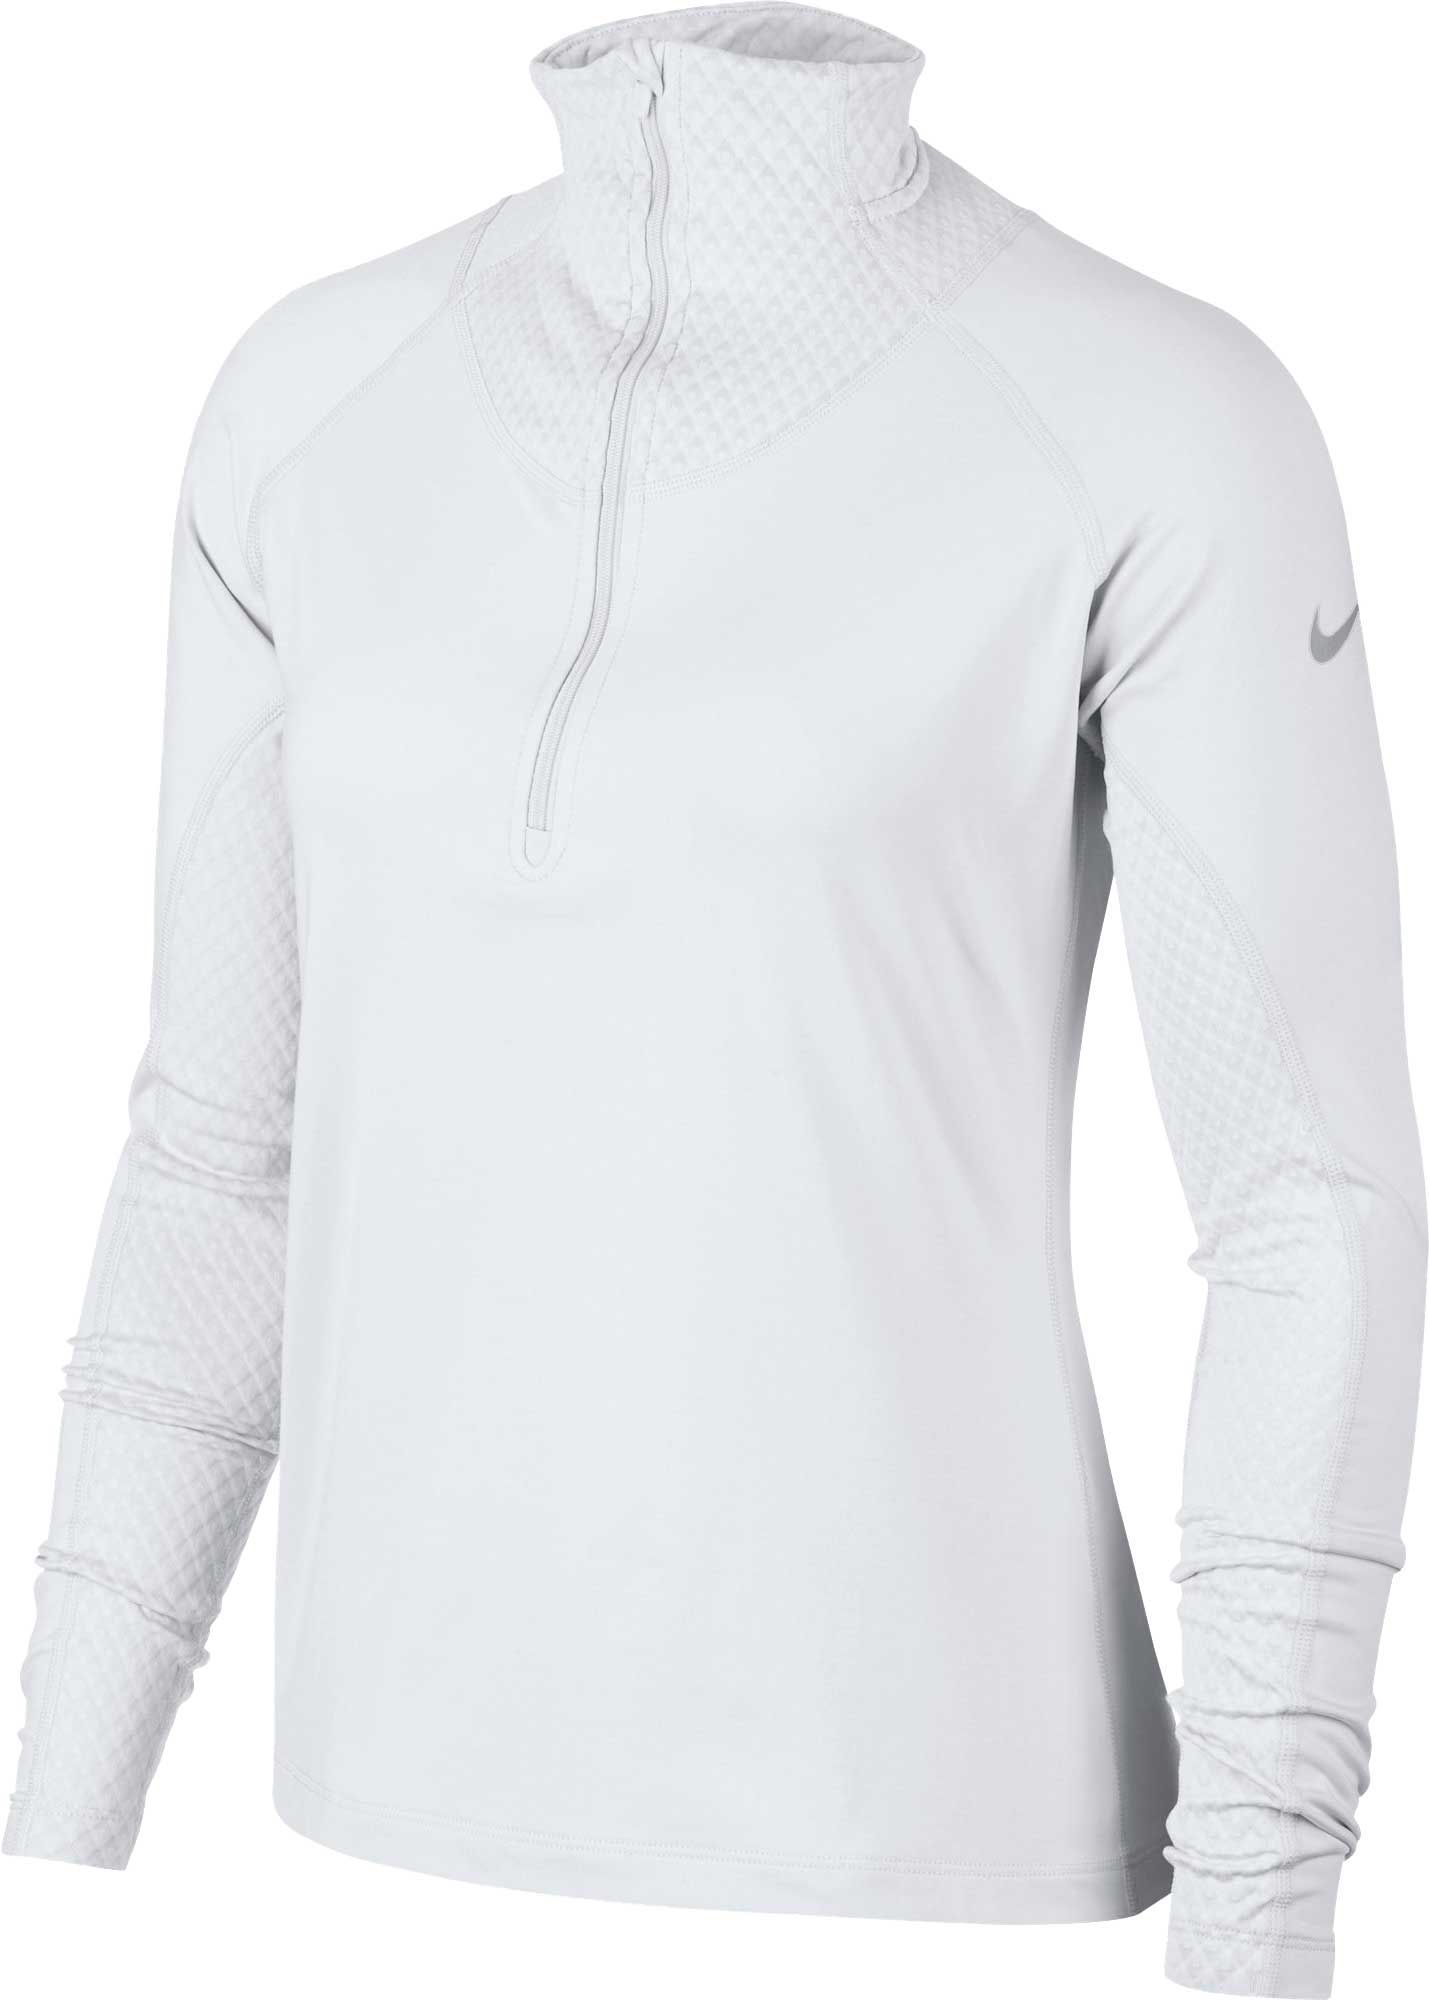 7509374acc Nike Women s Pro Warm Half-Zip Running Shirt in 2019